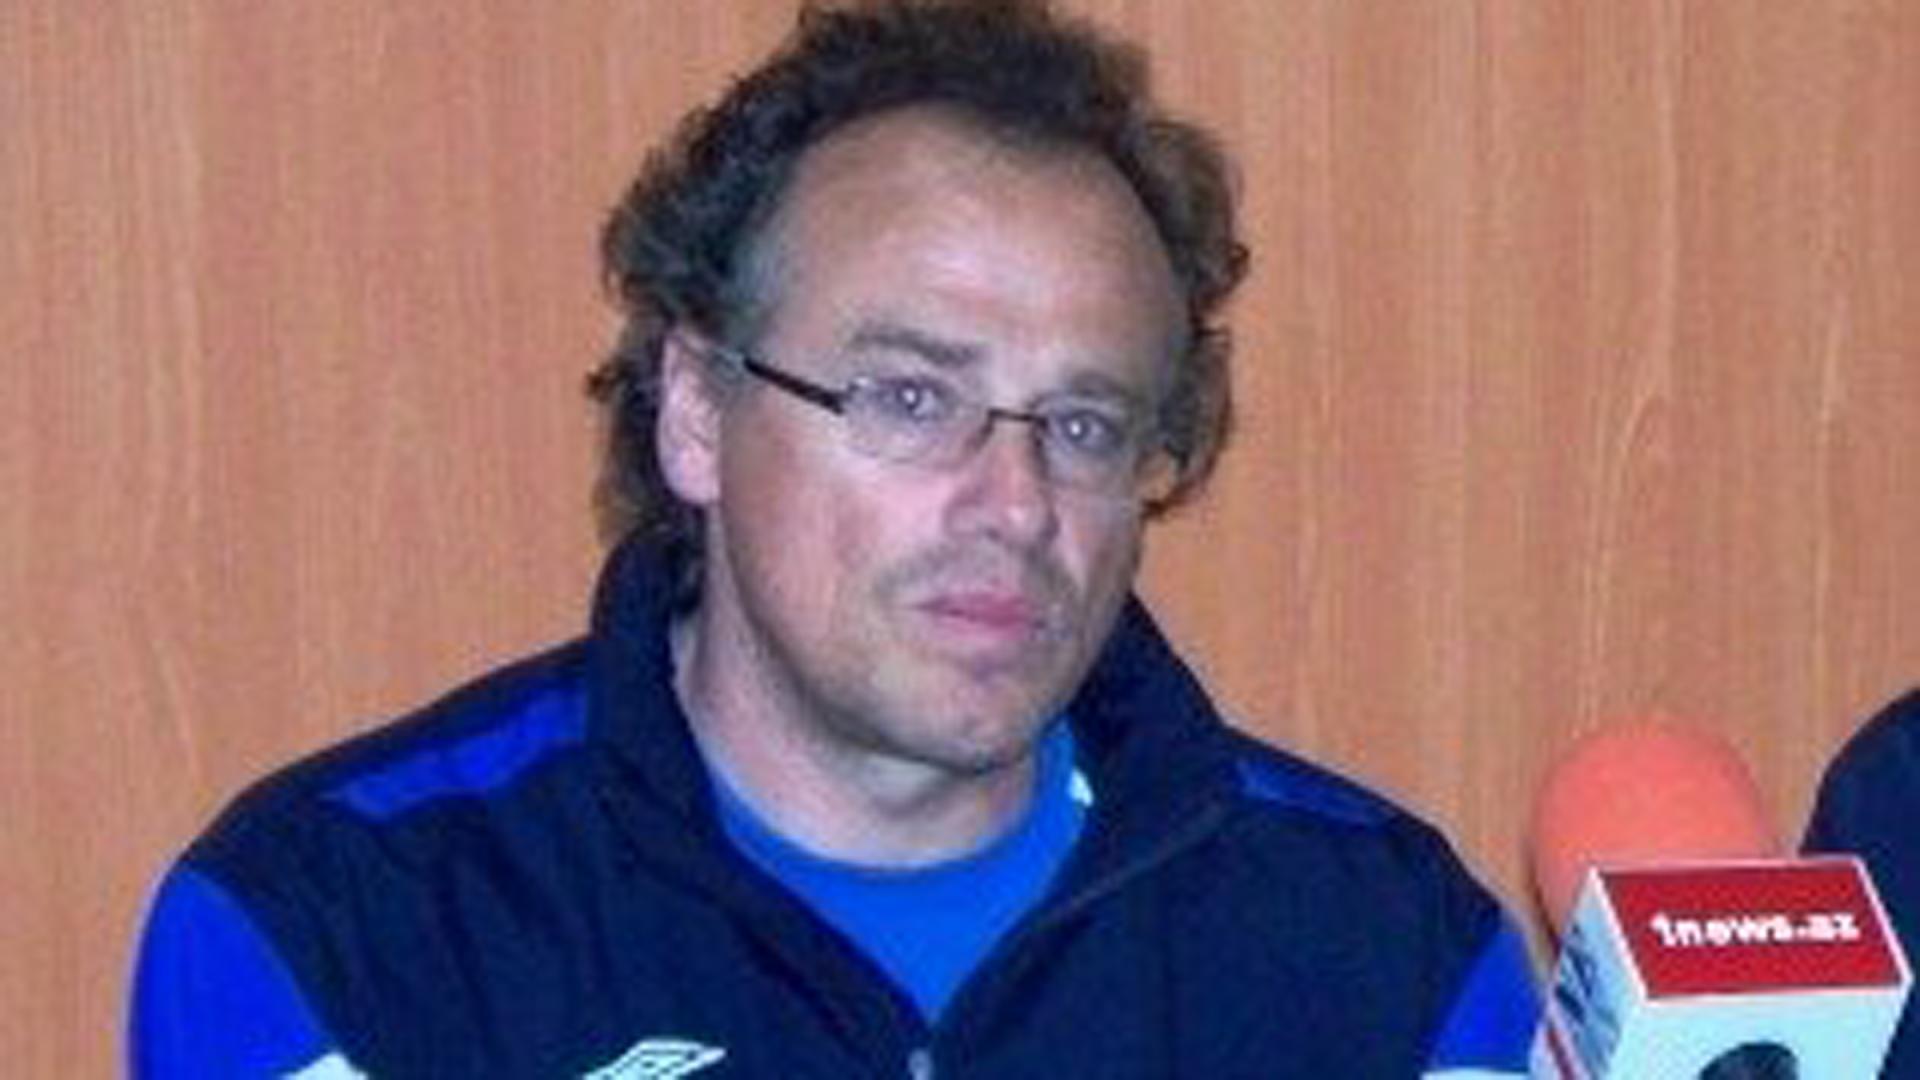 Official: Ghana FA settles on German coach Lippert as new technical director